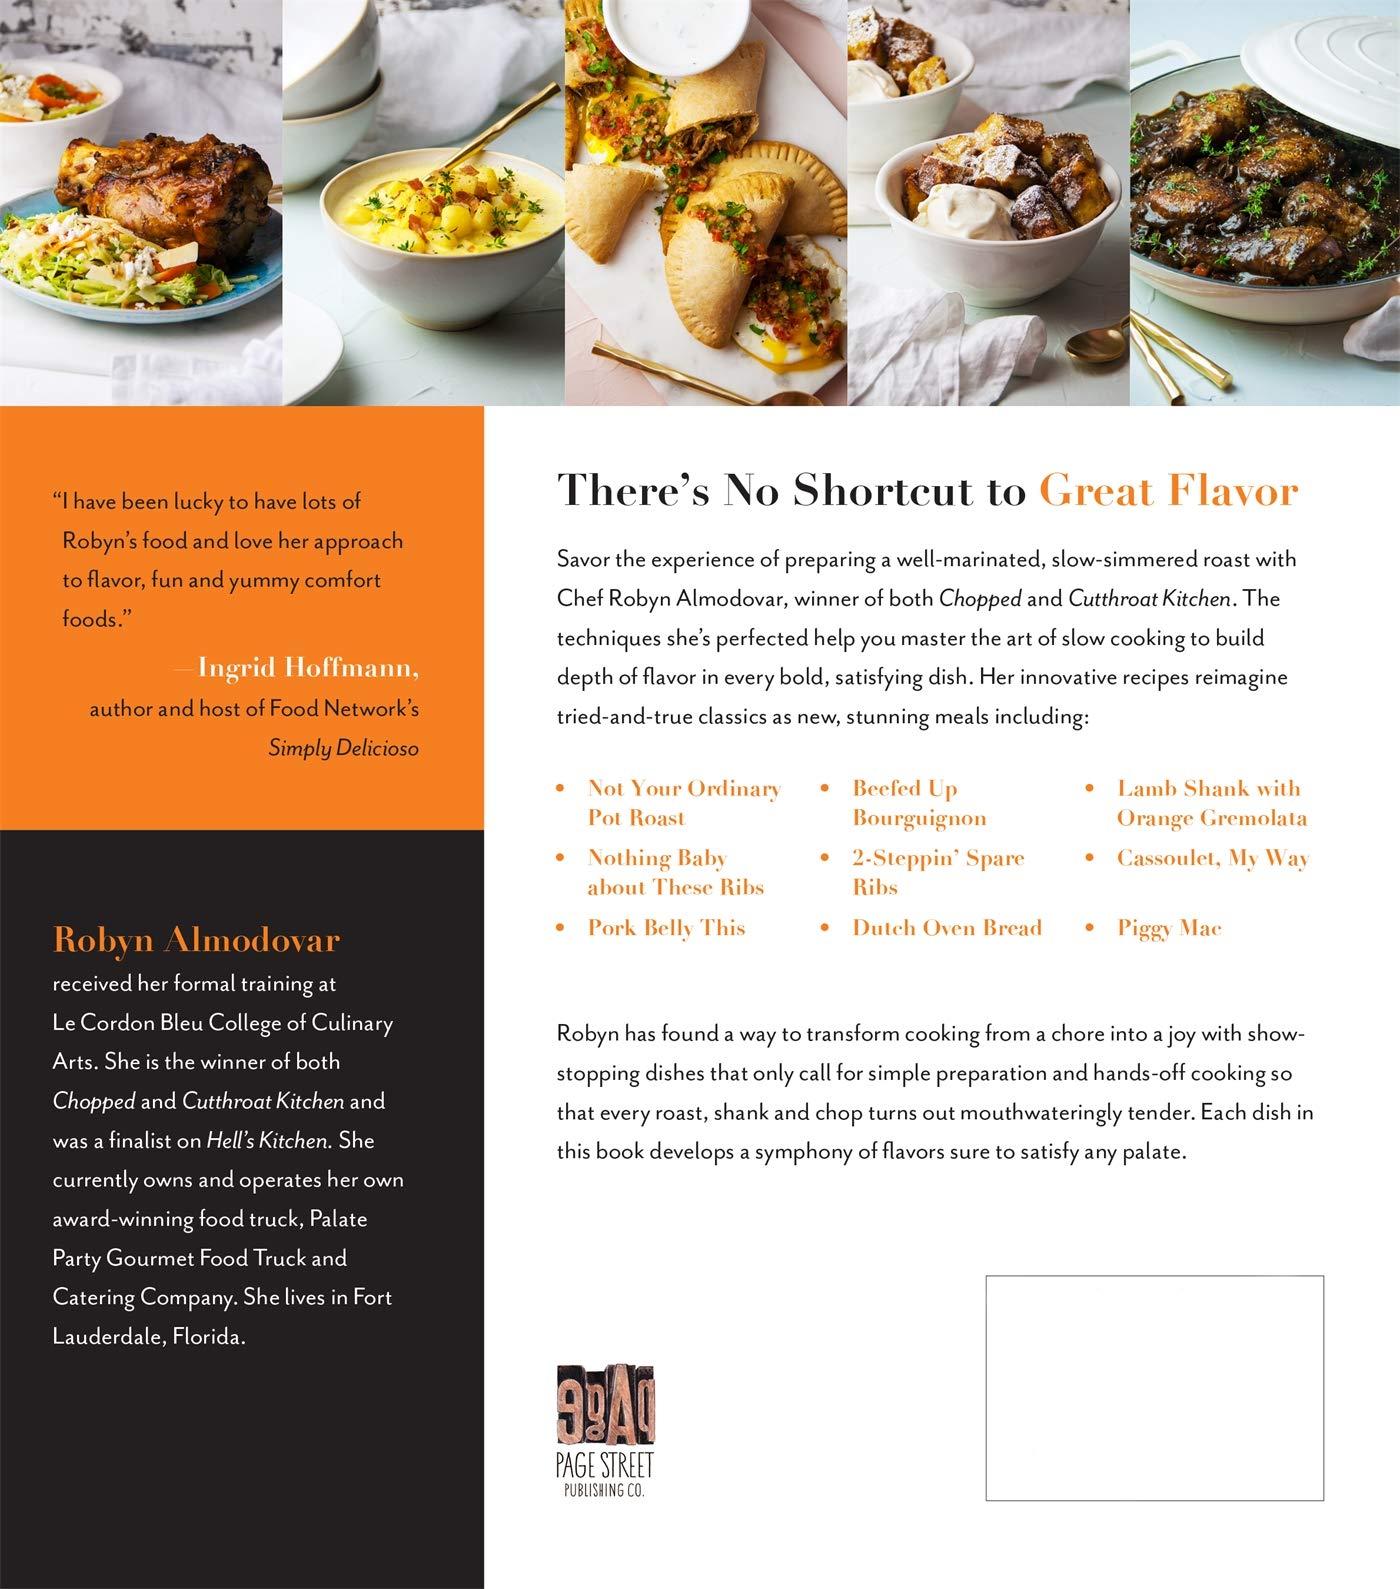 Almodovar R Low Slow Cooking 60 Hands Off Recipes That Are Worth The Wait Amazon De Almodovar Robyn Fremdsprachige Bucher